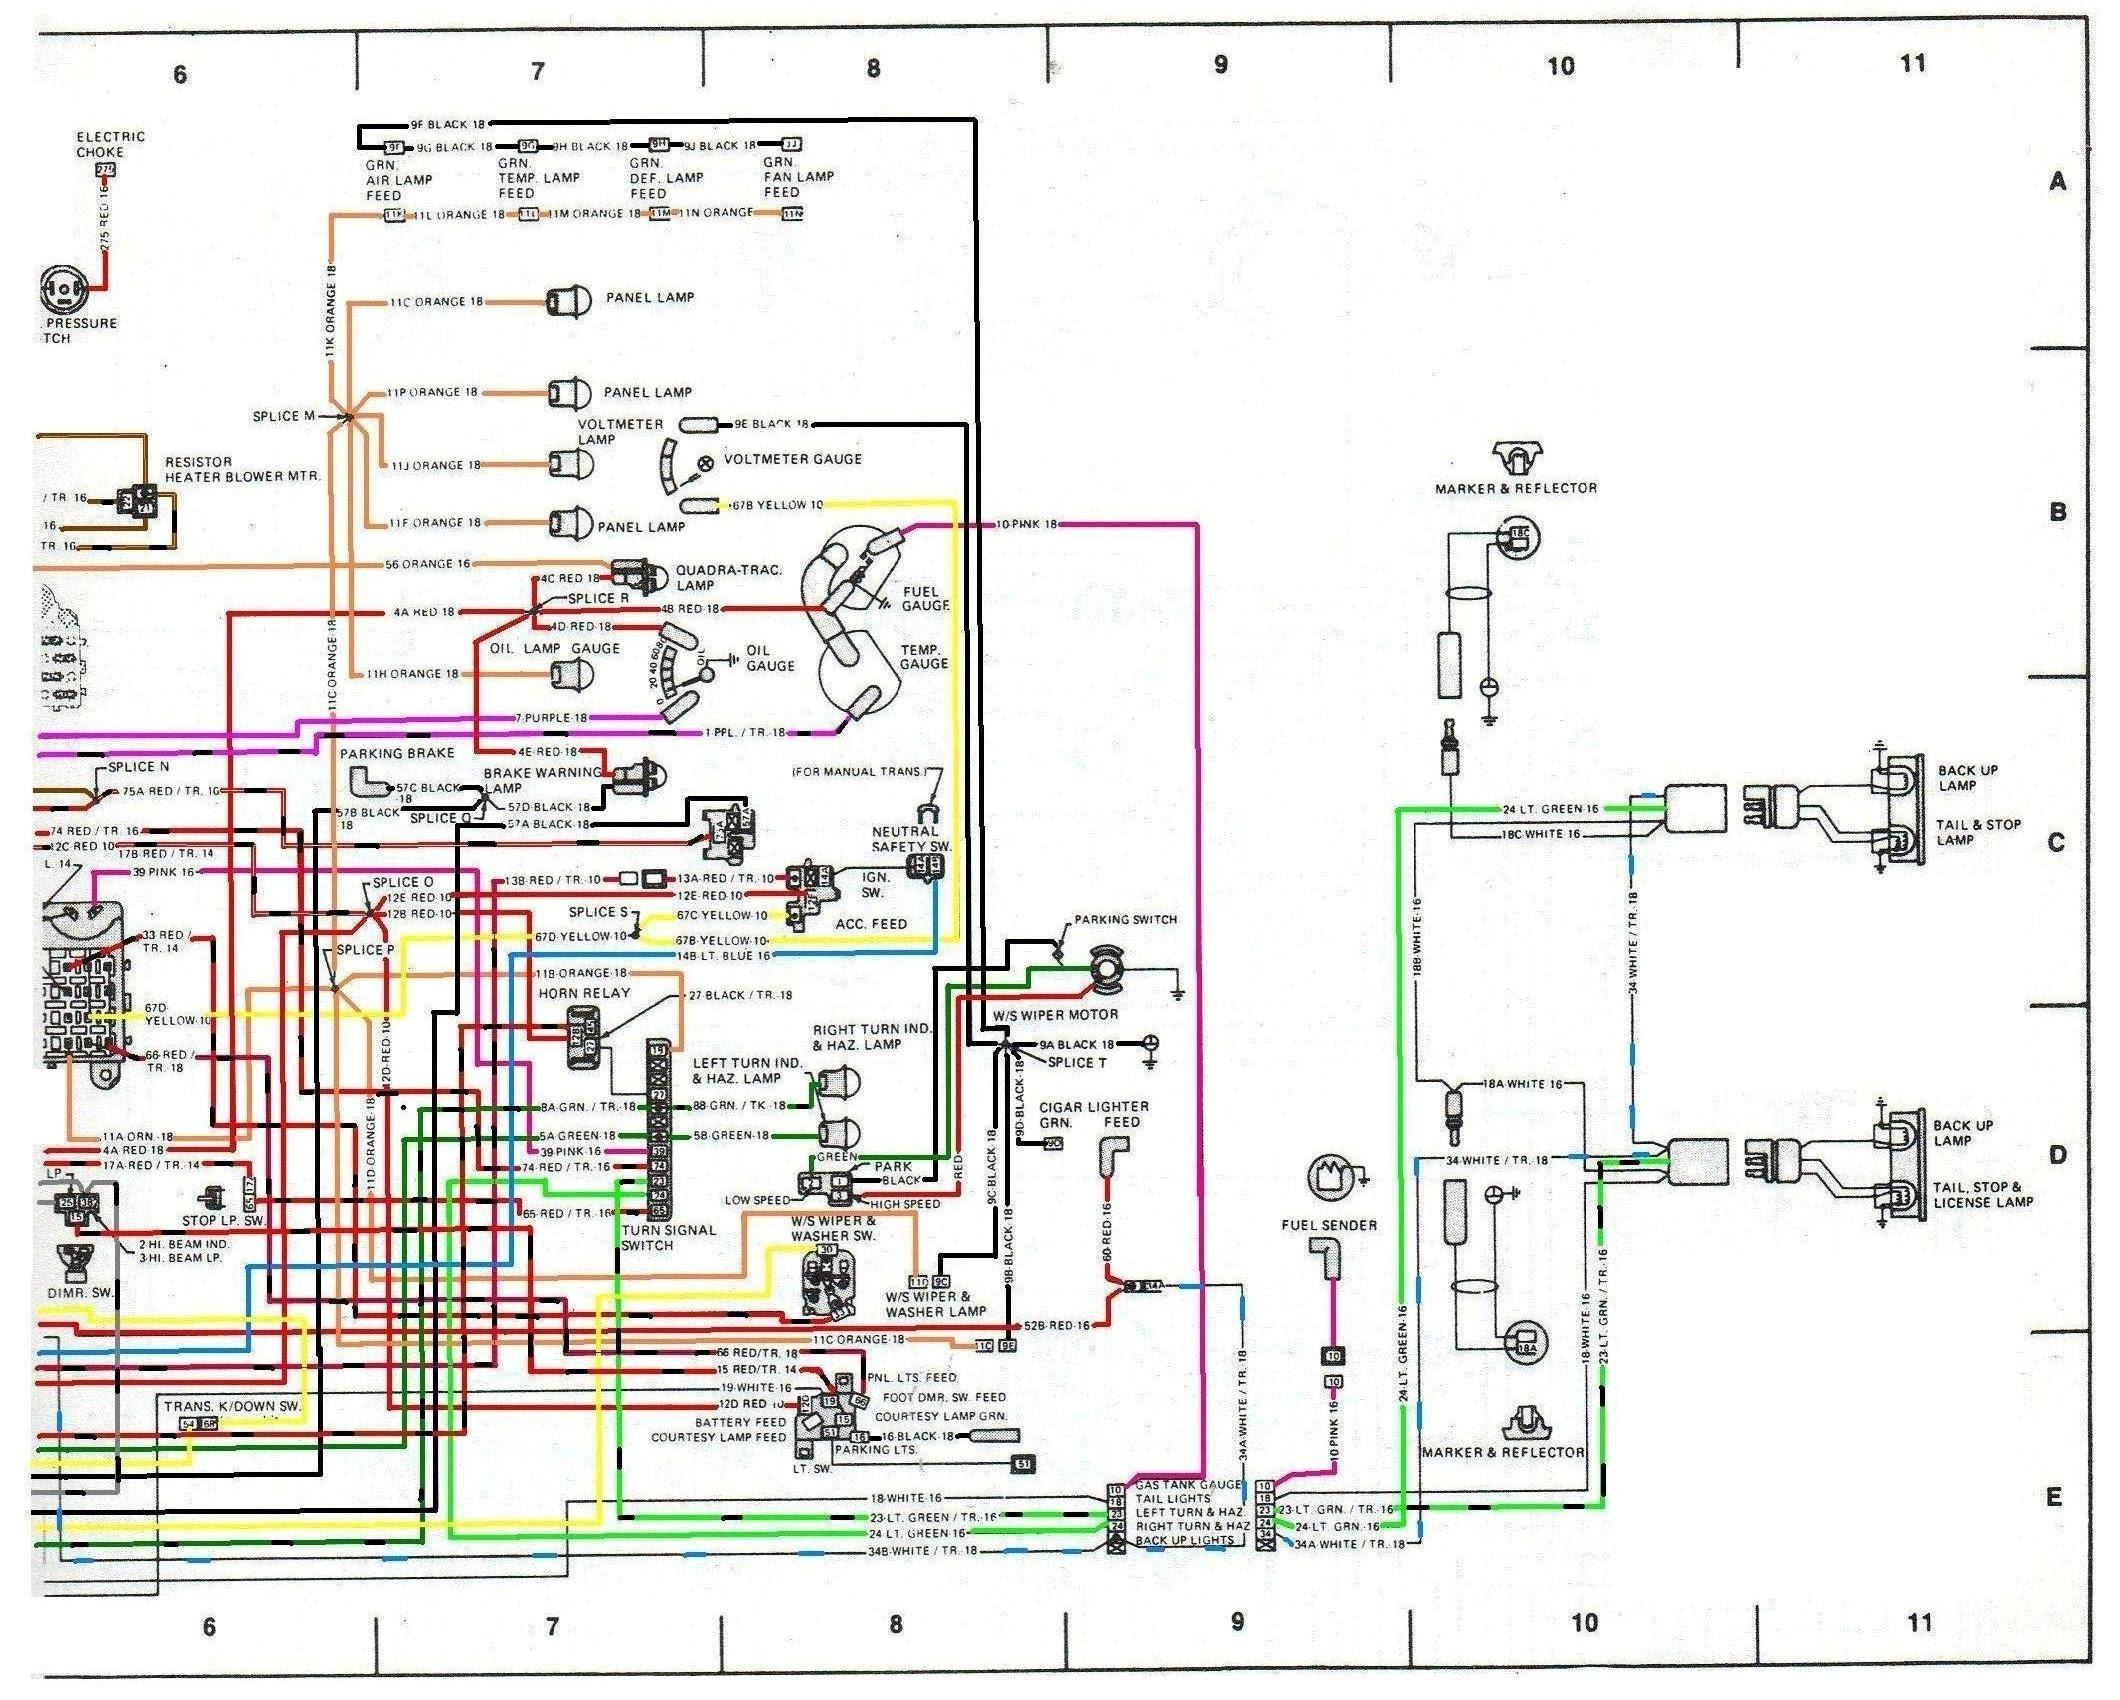 Cj Tachometer Wiring - Wiring Diagram | Cj7 Tachometer Wiring Diagram |  | Wiring Diagram